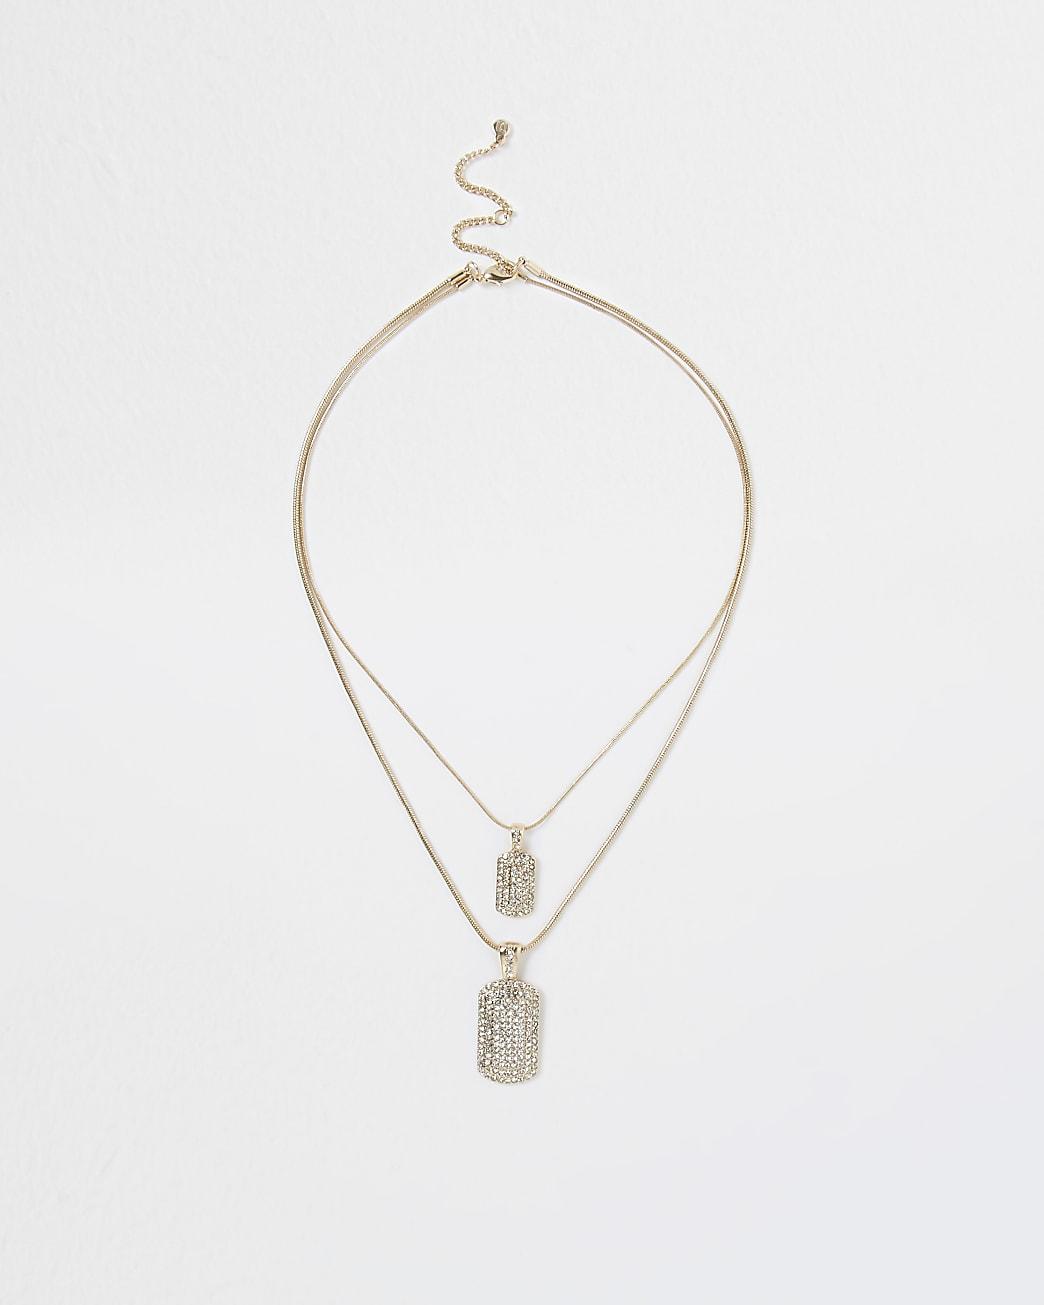 Gold rhinestone dog tag necklace